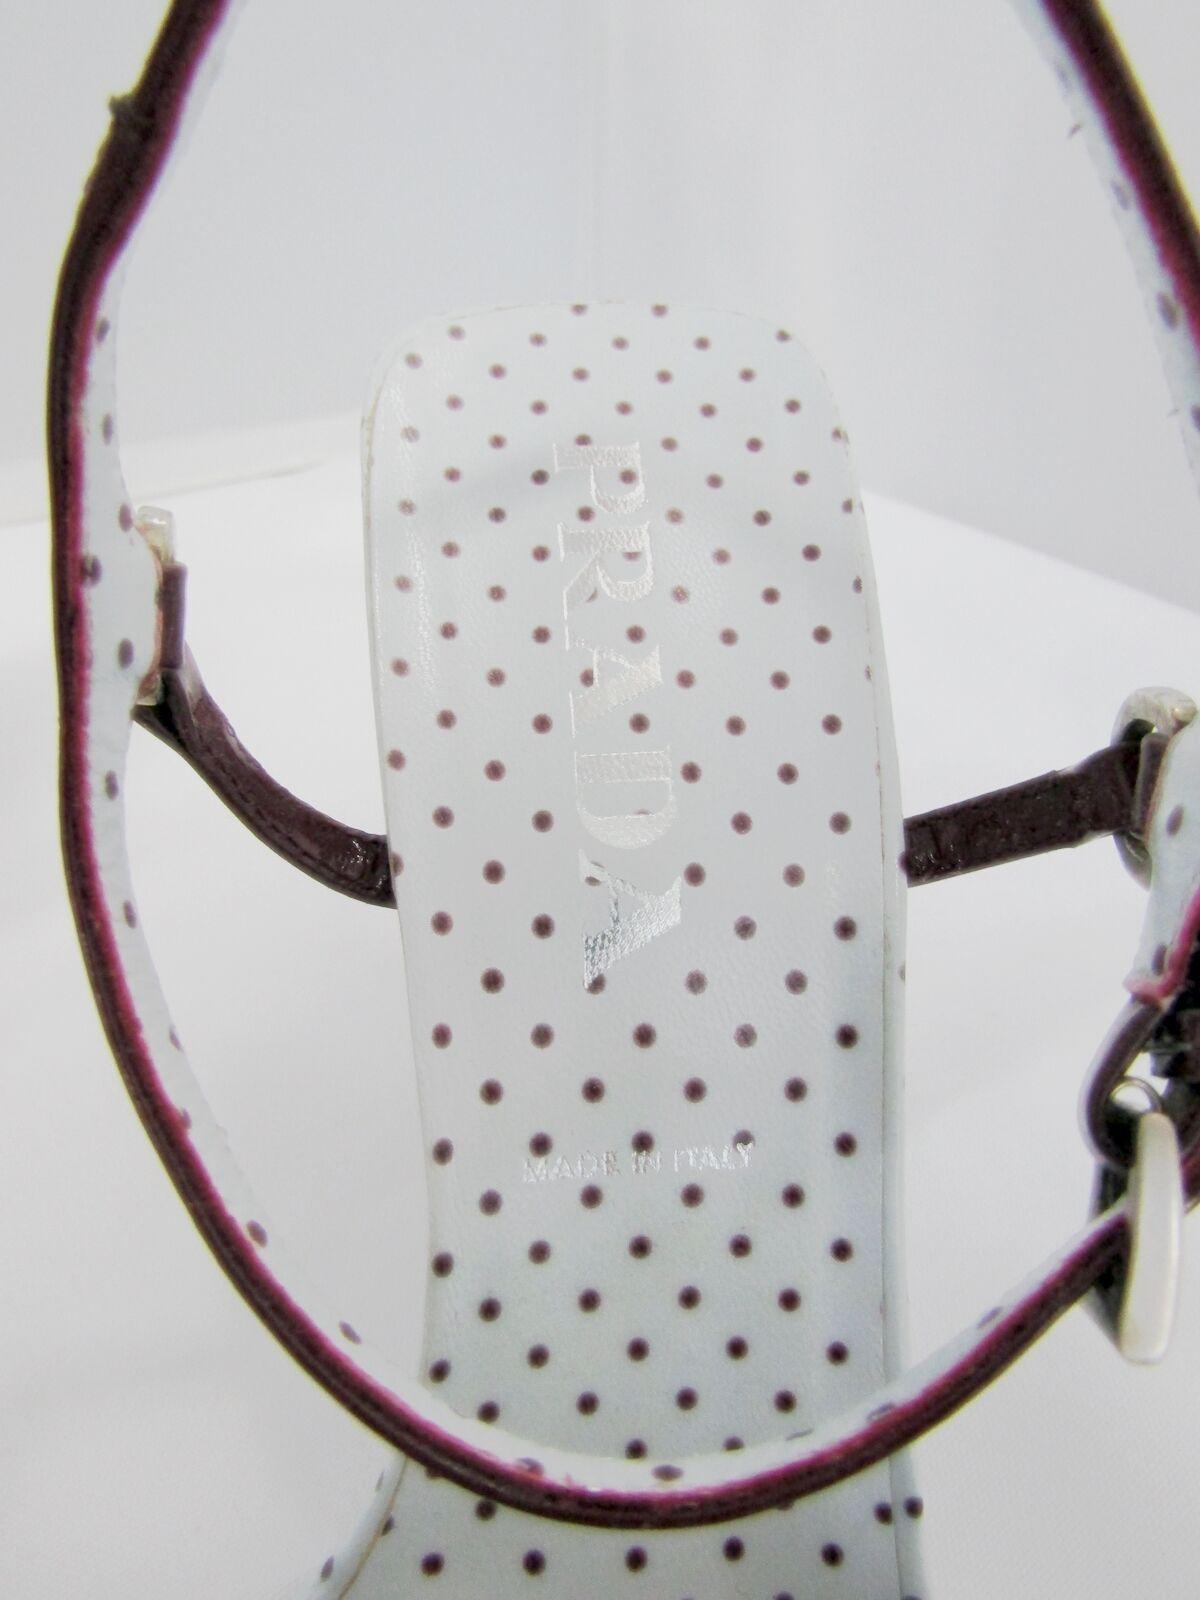 NEW PRADA CUTOUT 38.5 POLKA DOT WEDGES SANDALS WINE Weiß 38.5 CUTOUT 8.5 ASYMMETRIC HEEL fad2c3